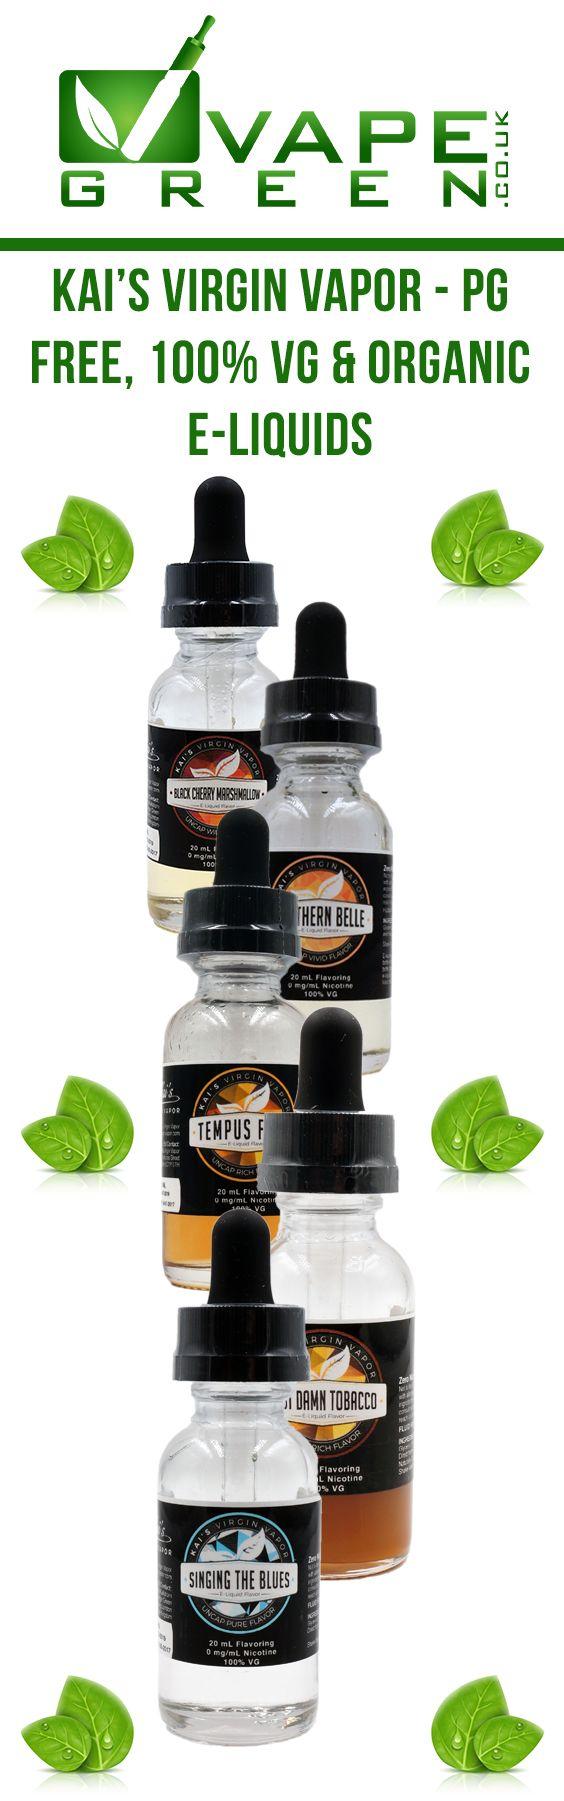 Kai's Virgin Vapor 100% VG & Organic E-liquids available at VapeGreen.co.uk #kaisvirginvapor #organic #100vg #pgfree #eliquid #ejuice #vapegreen #vape #vaping #vapor #vapeuk #ukvapers #vapefam